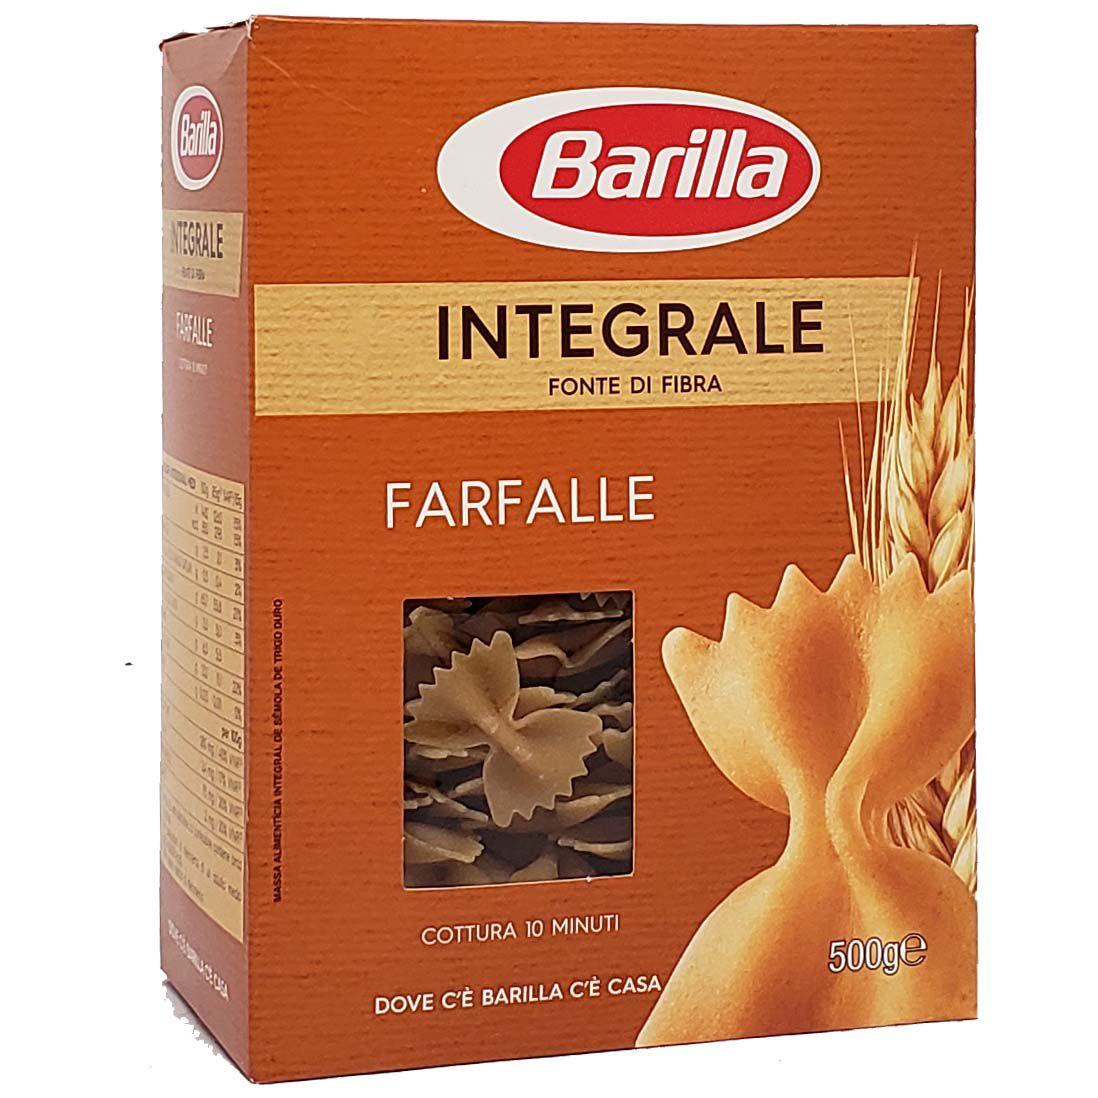 Macarrão Farfalle Integrale Barilla - 500g -